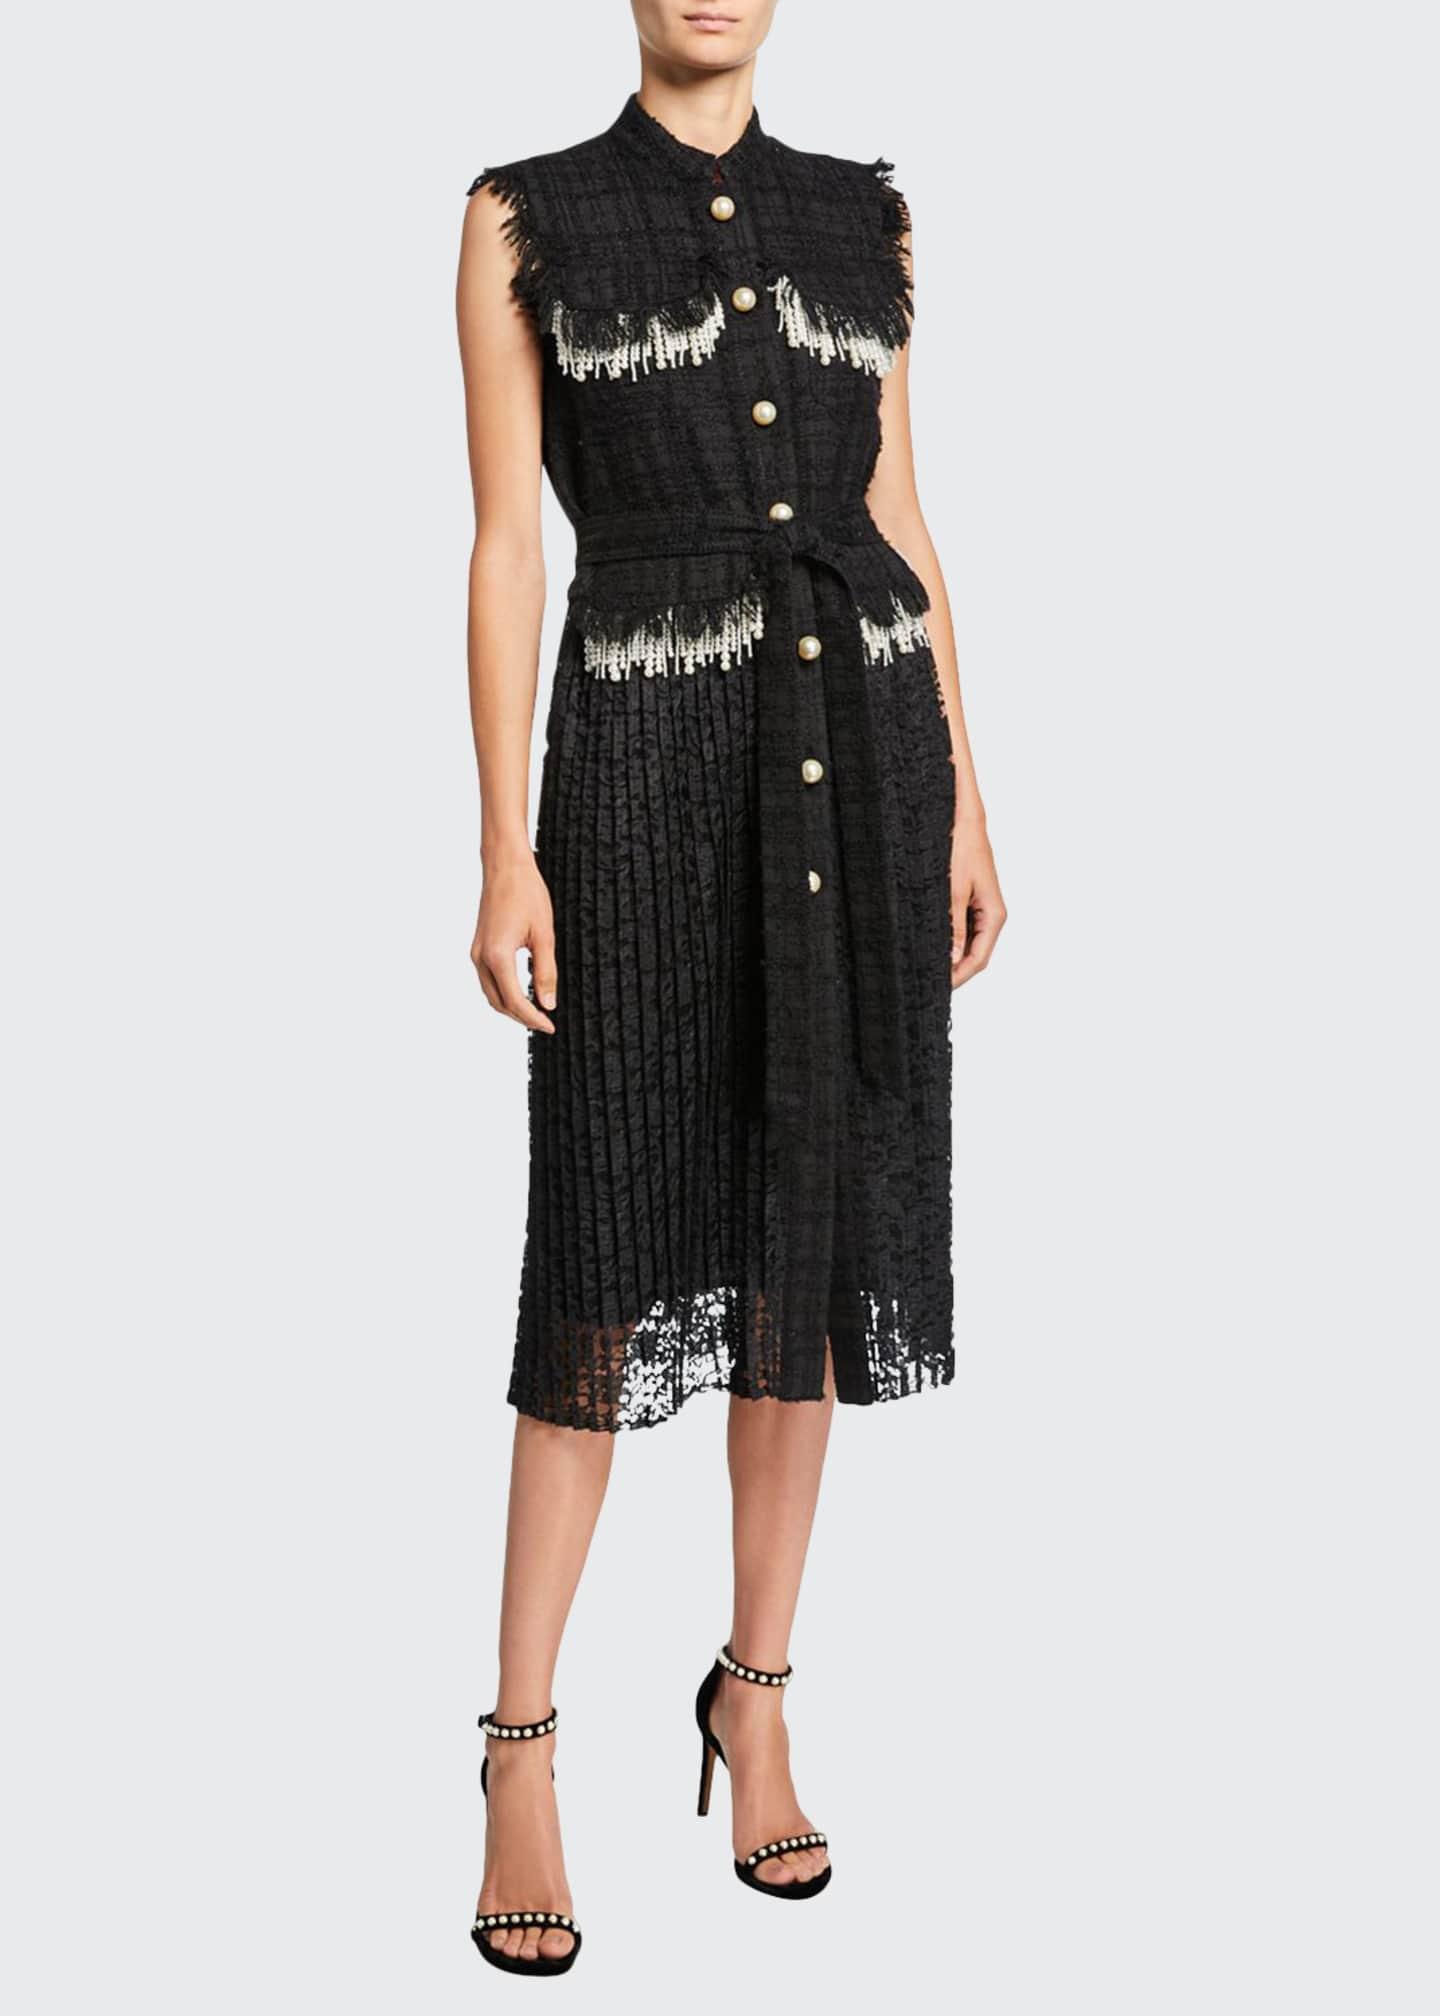 Huishan Zhang Sleeveless Tweed Dress w/ Pearly Trim